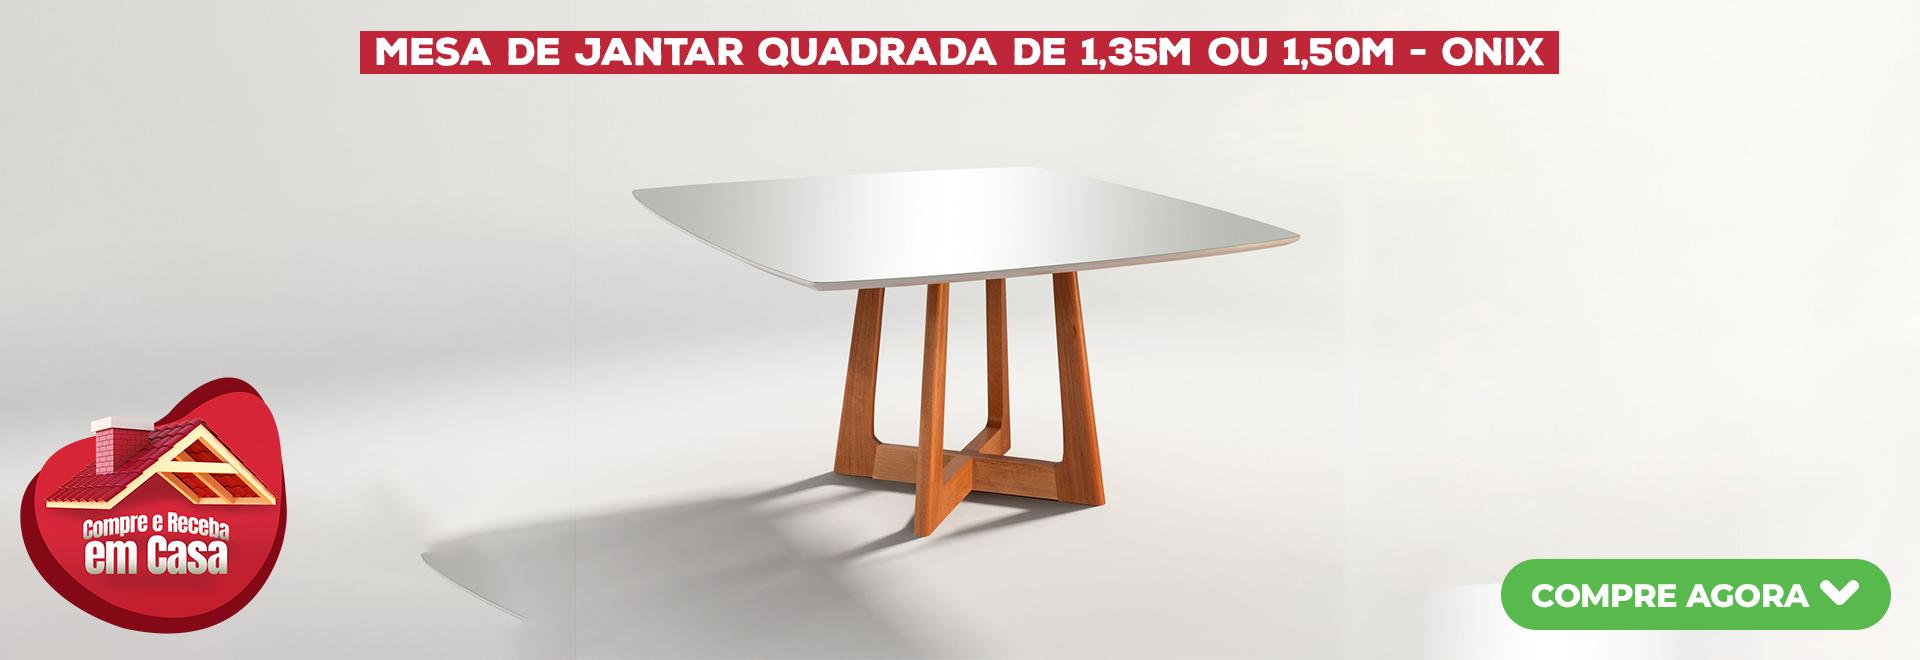 Mesa de Jantar Quadrada de 1,35m ou 1,50m - ONIX